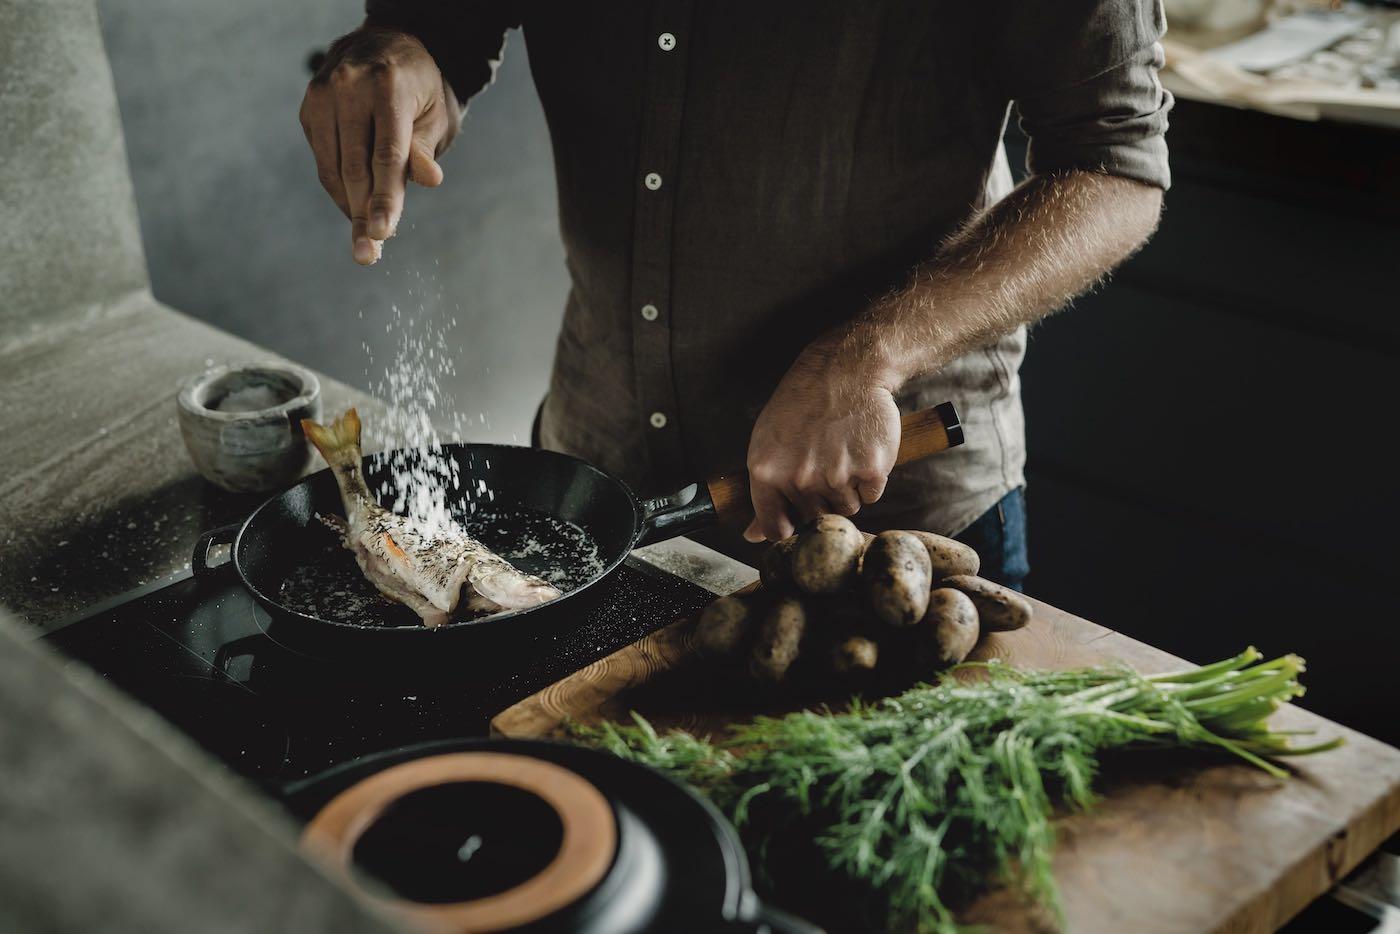 Gusseisen-Pfanne für Induktion , Fiskars, Finnland, Finnische Geschirrserie, Kochgeschirr